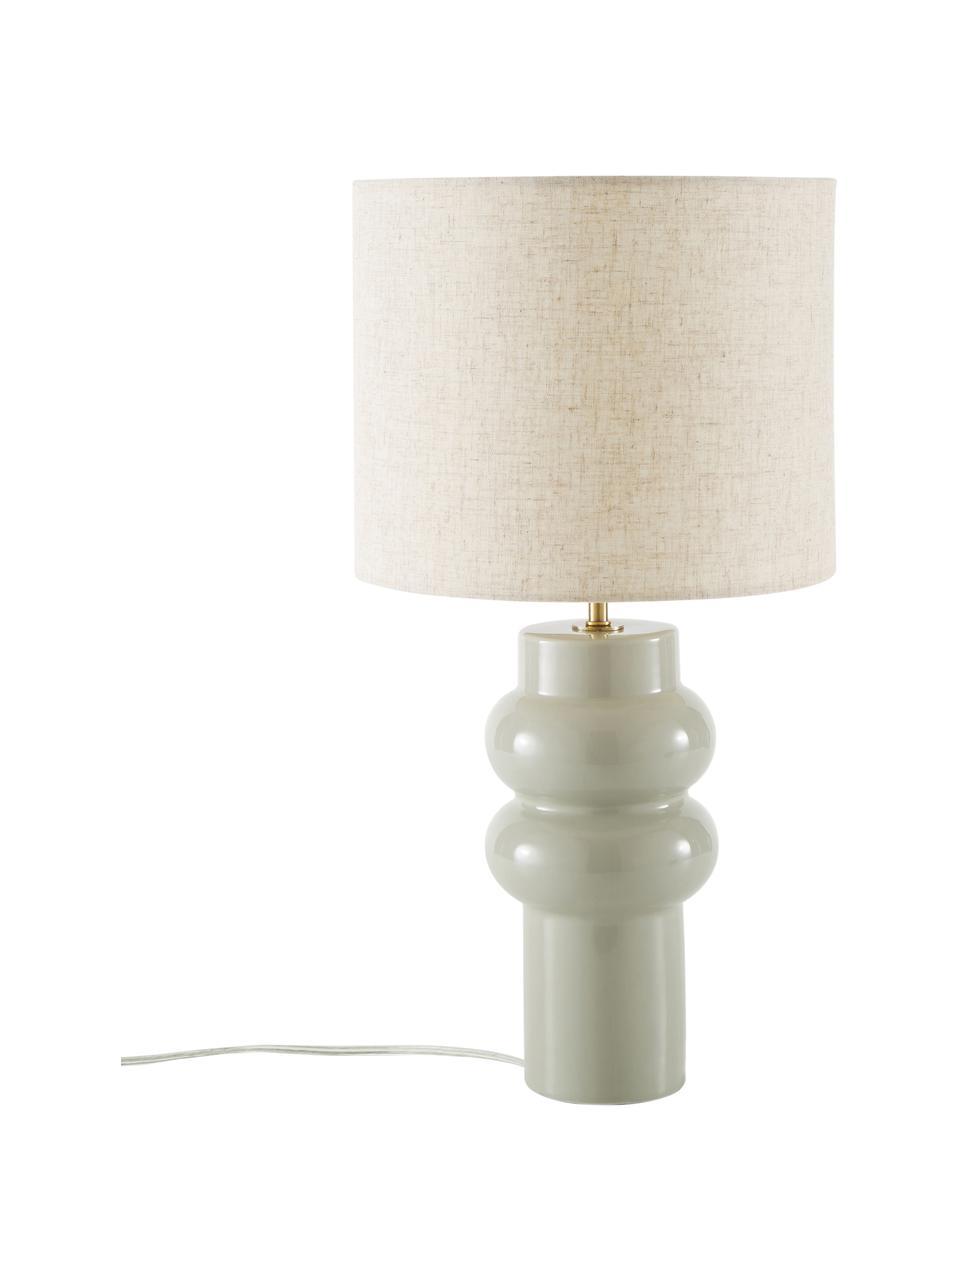 Grande lampe à poser en céramique Christine, Beige, gris